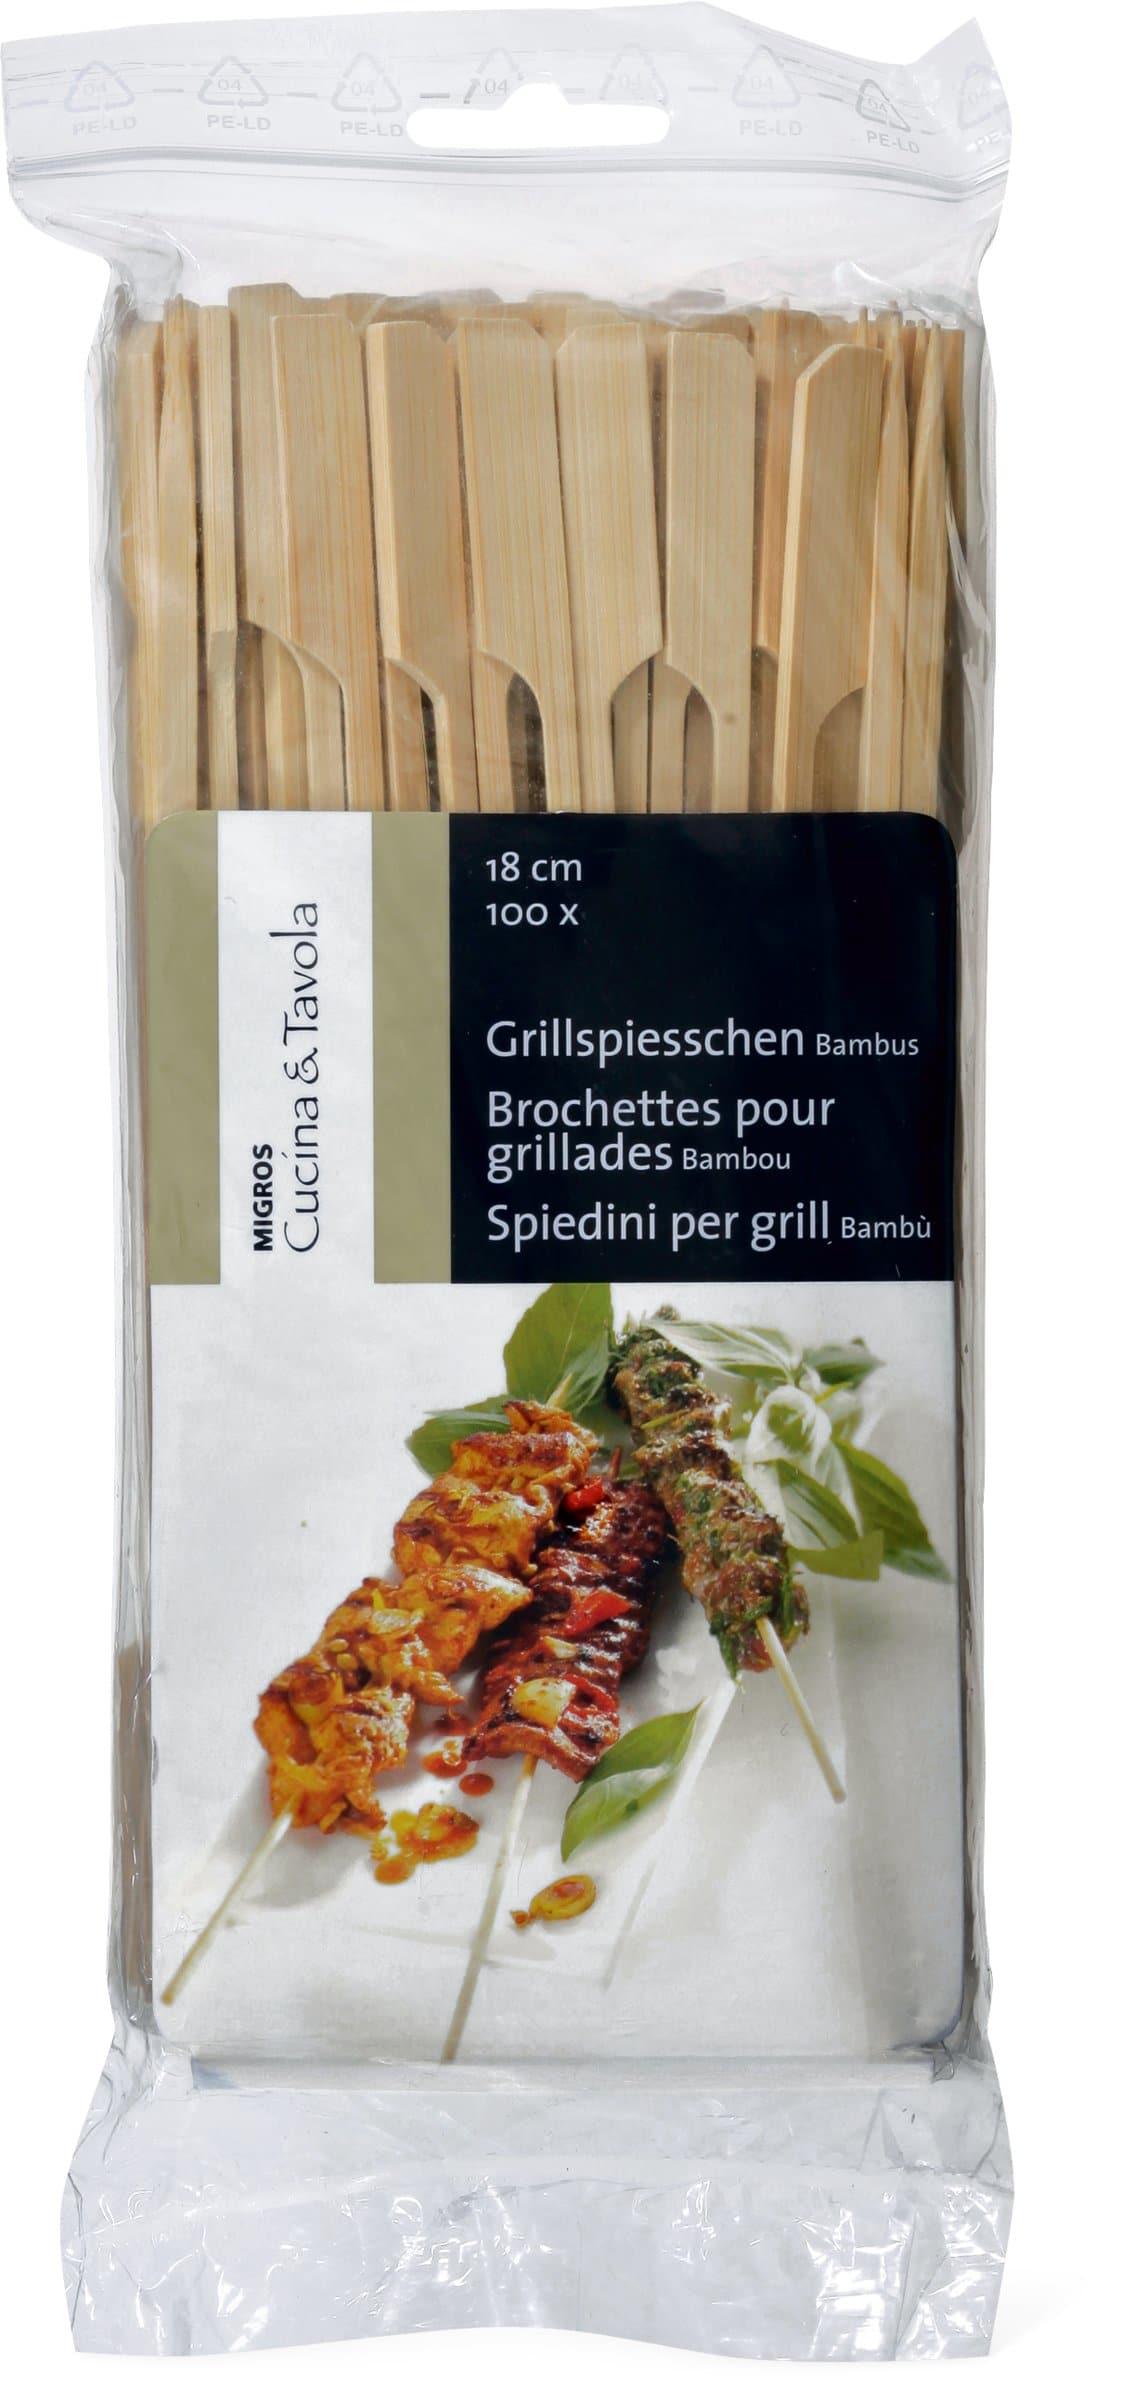 Cucina & Tavola CUCINA & TAVOLA Spiedini per grill